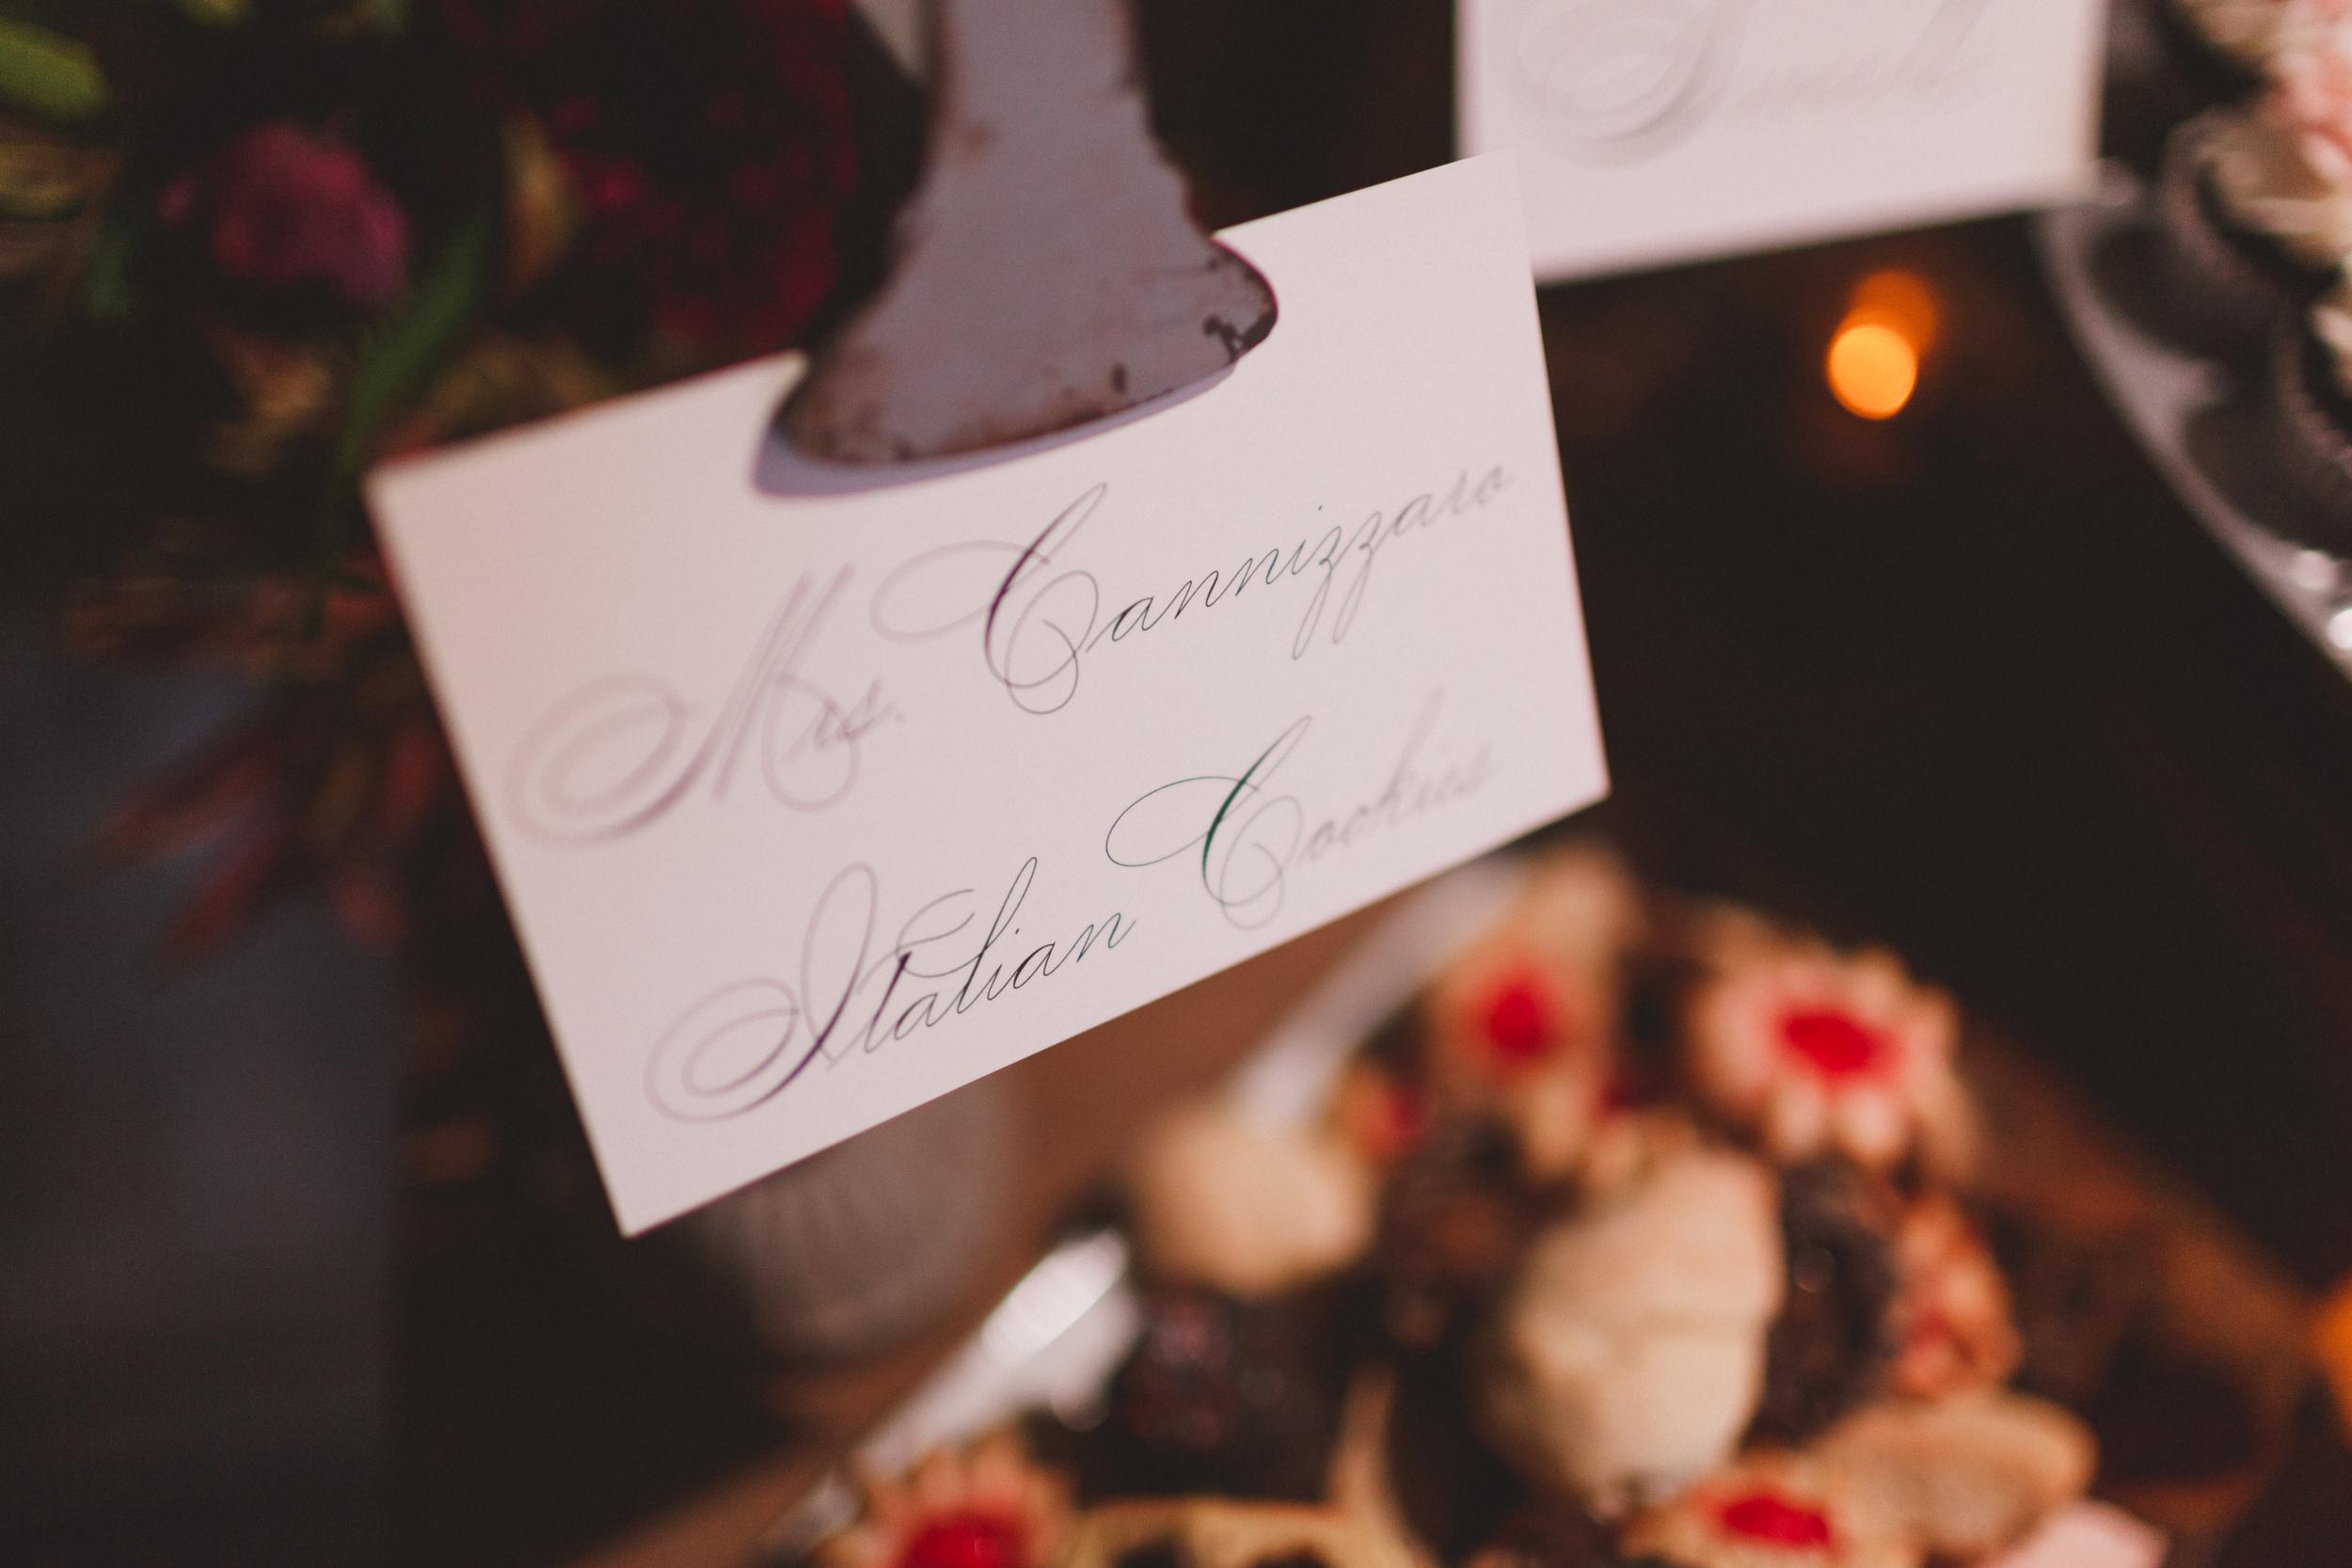 JENNIFER-SKOG-dane-nate-santa-lucia-preserve-wedding-0600.jpg